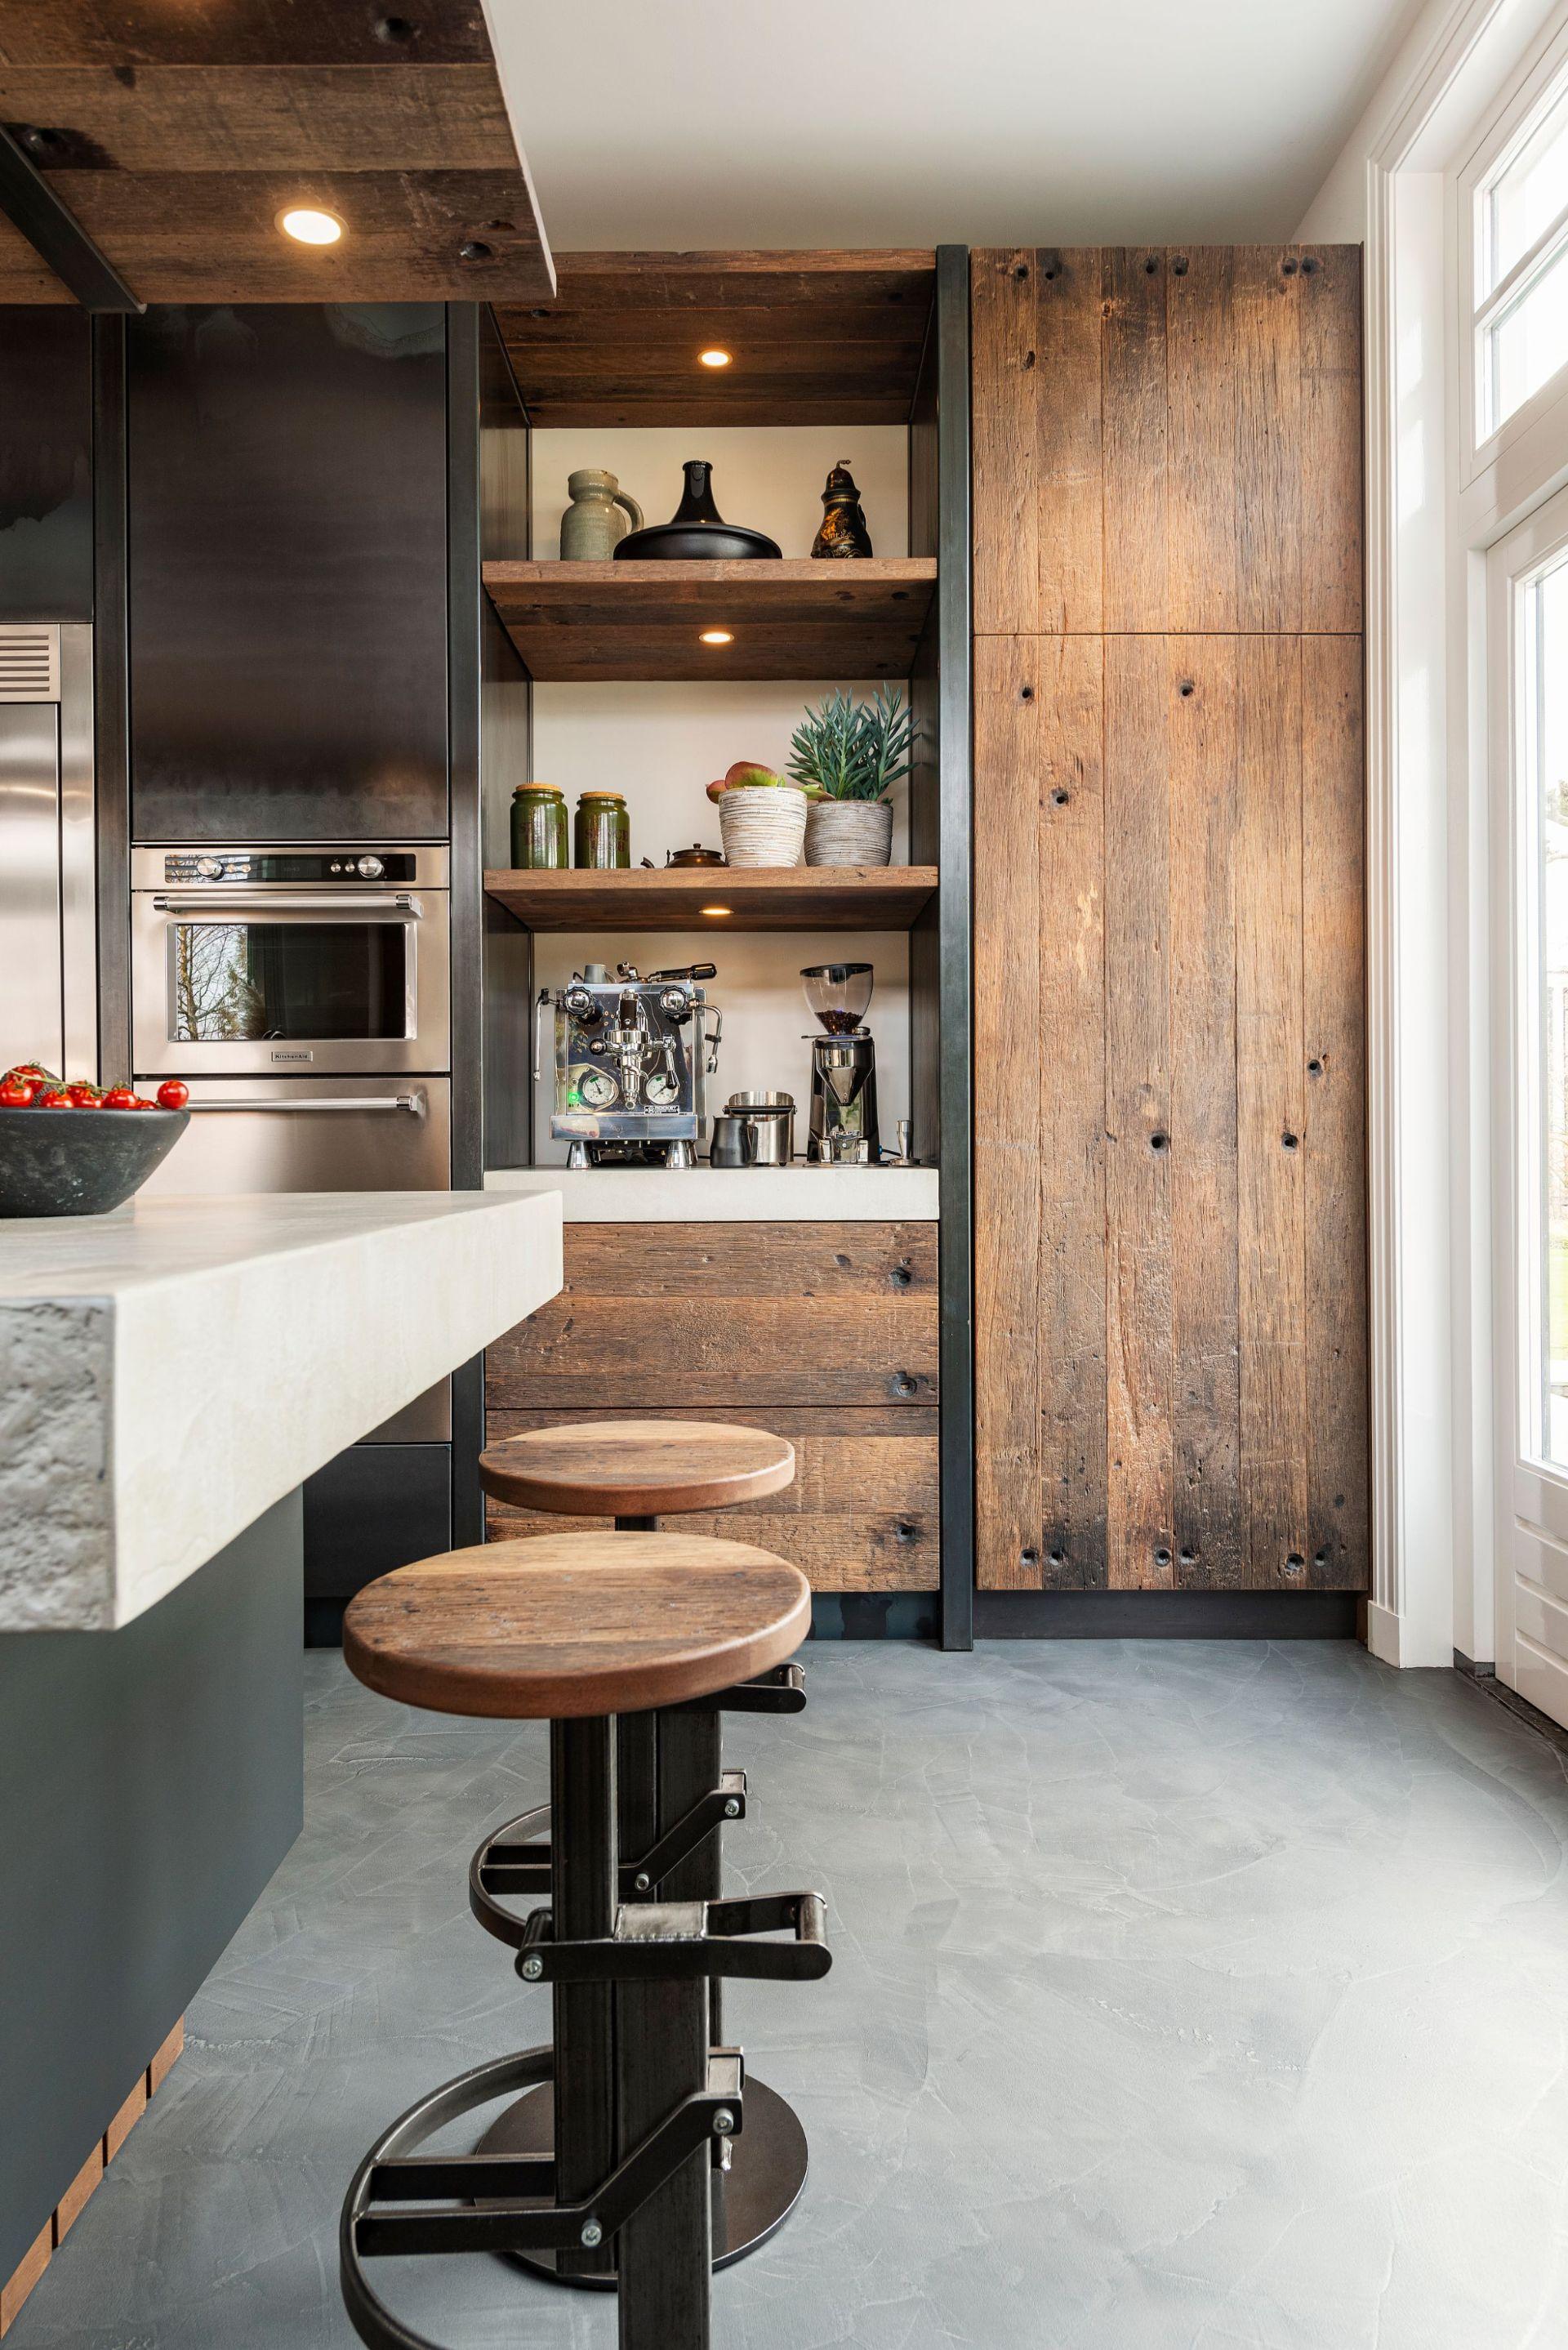 Industriele keuken hout en staal van RestyleXL. Industriële krukken aan kookeiland. KitchenAid apparatuur #restylexl #keuken